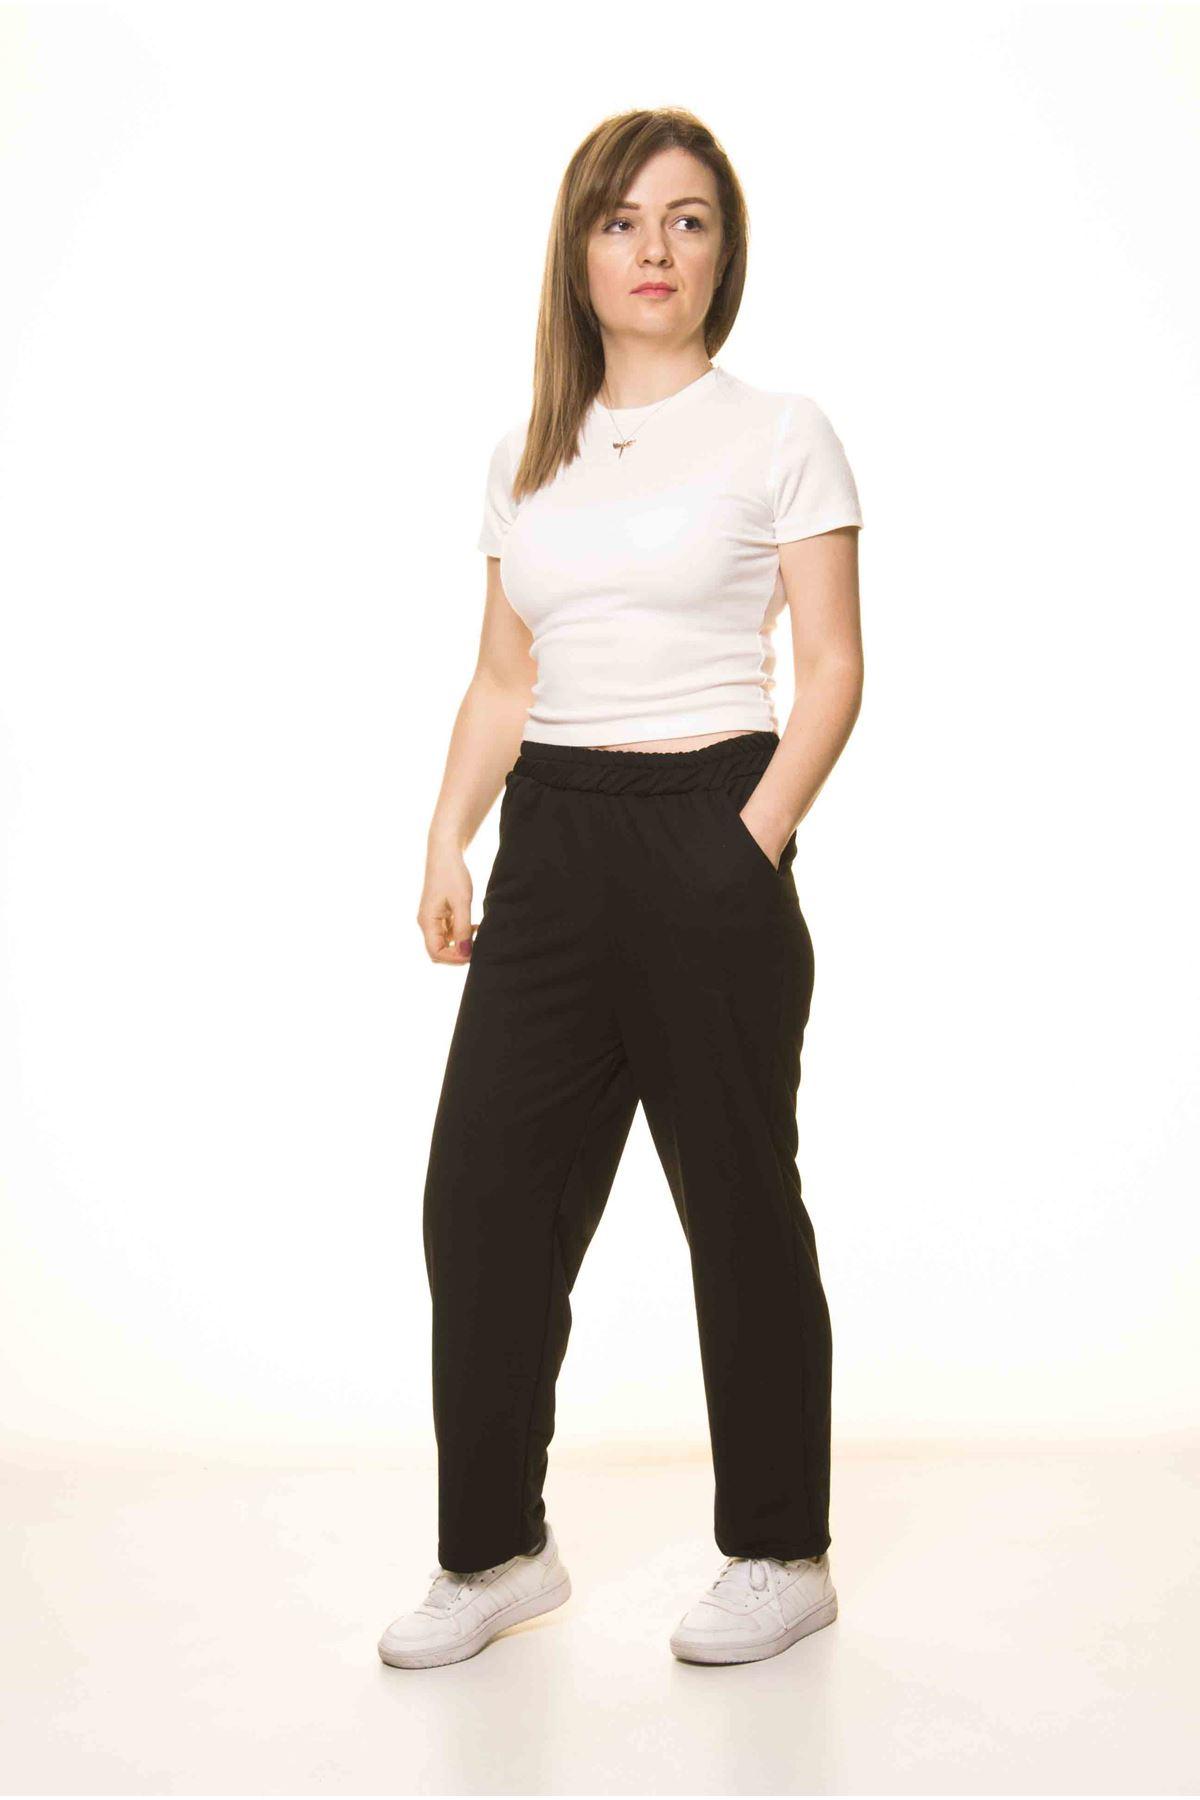 Kadın Siyah Normal Paça  Eşofman Altı 5D-3074